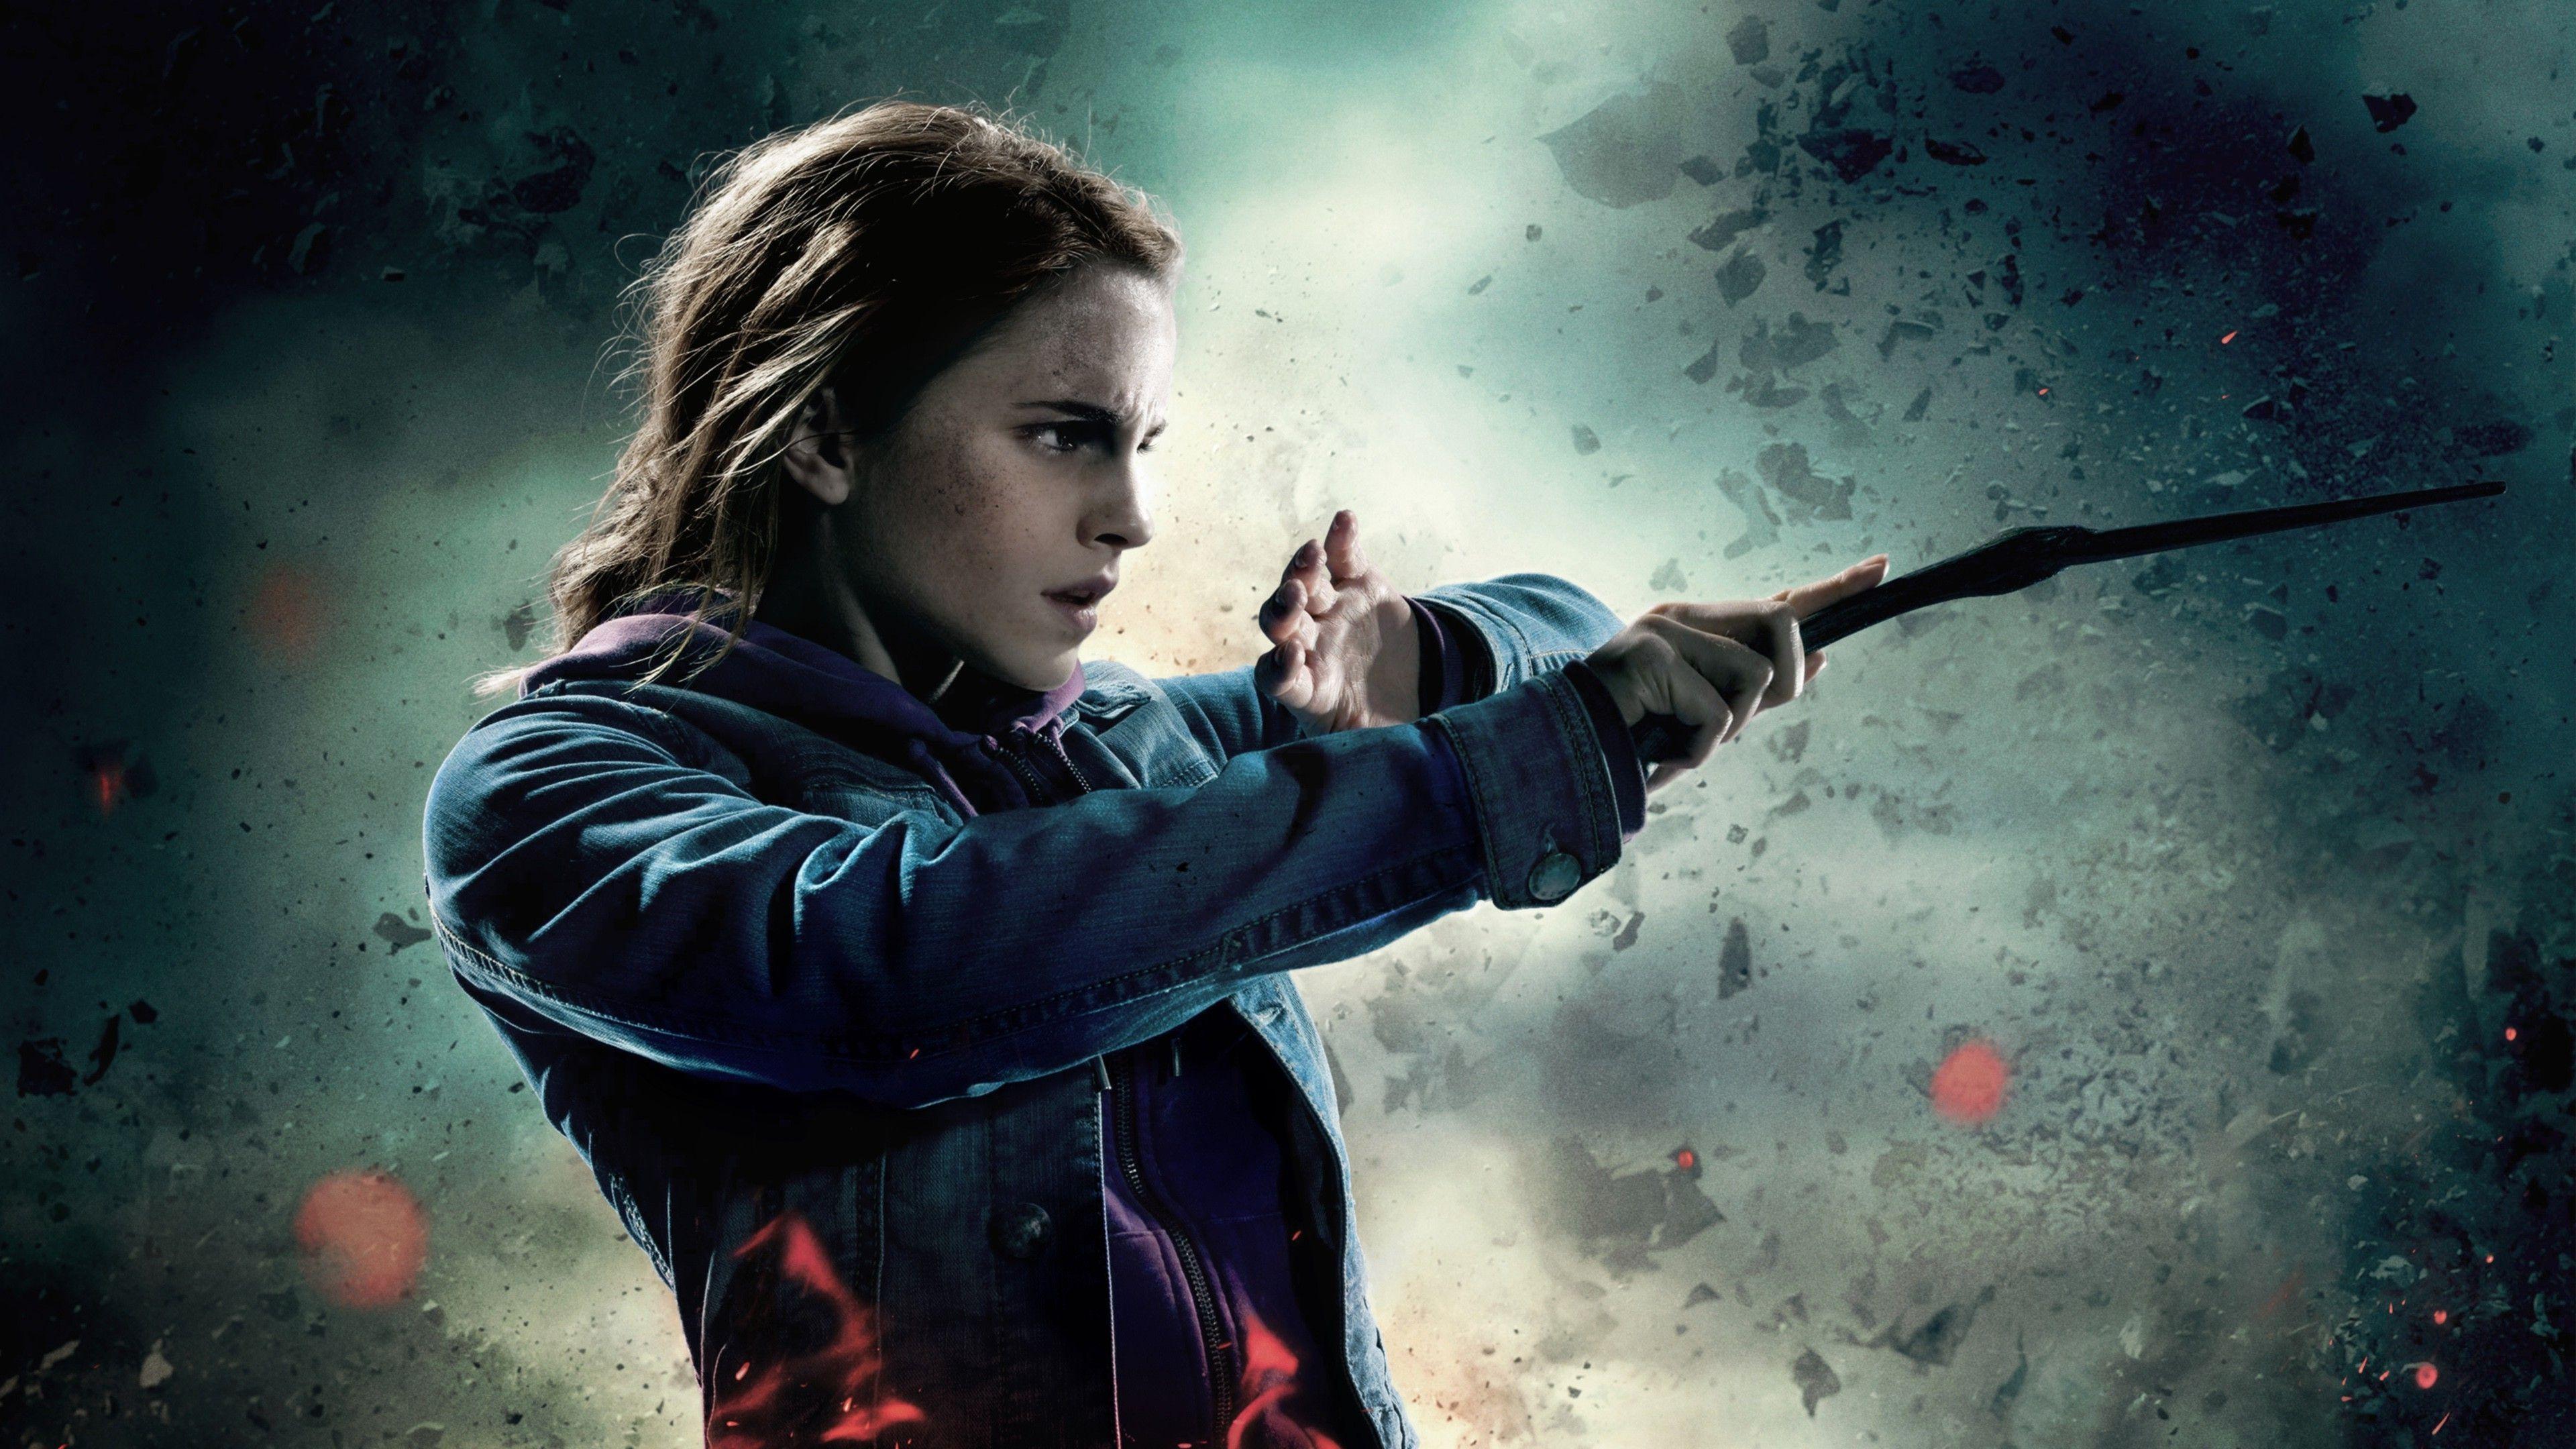 Hermione Granger Harry Potter Wallpapers - Wallpaper Cave